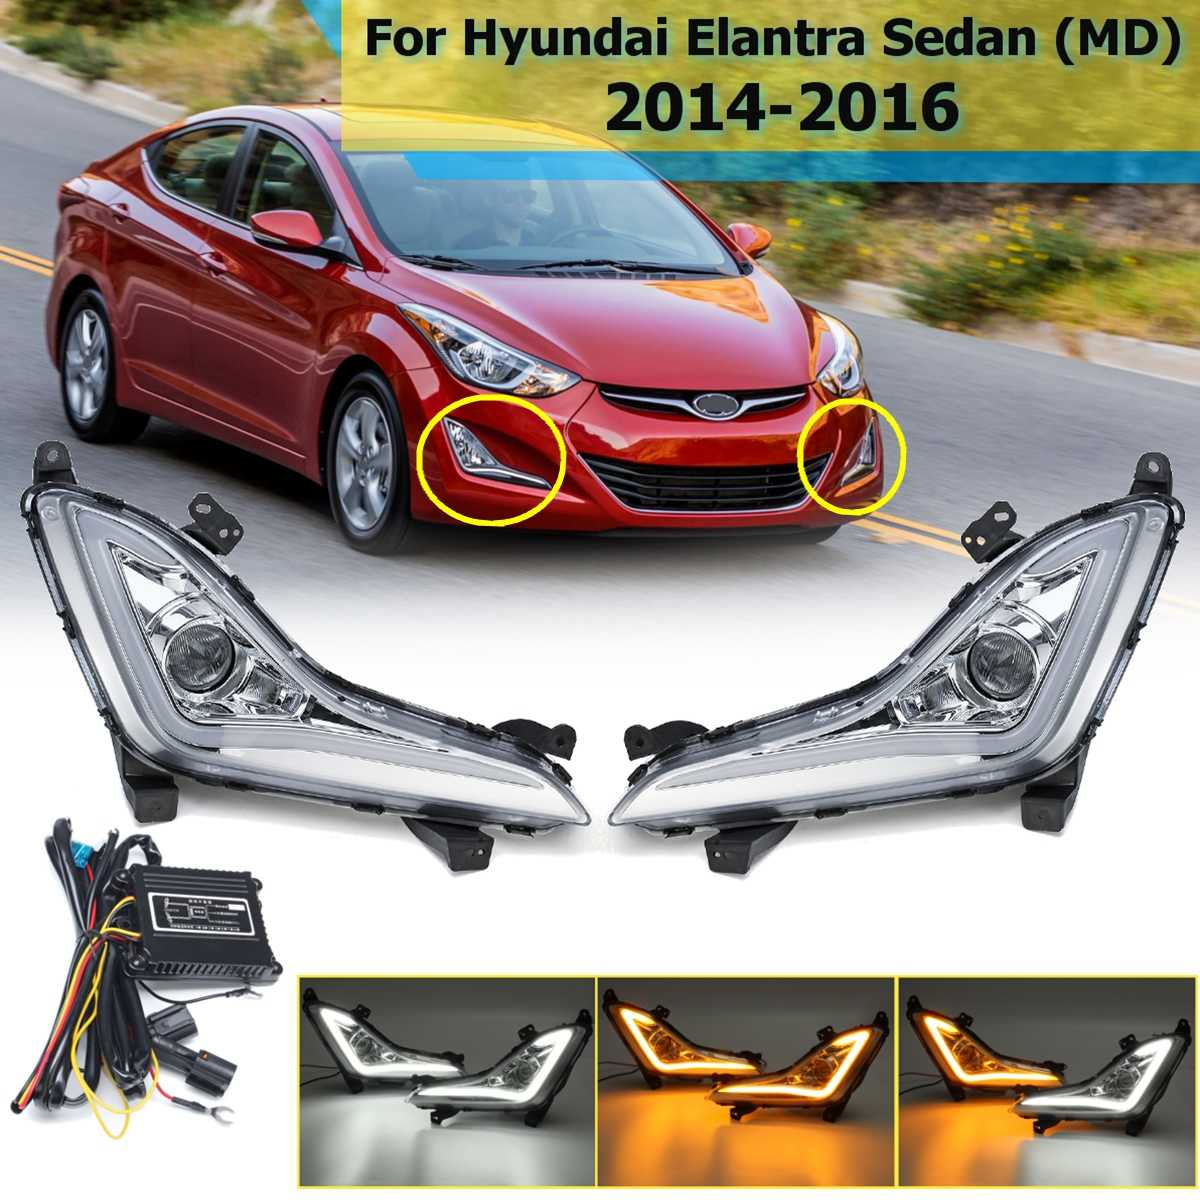 1 par Dianteiro Led DRL Para Hyundai Elantra Sedan 2014 2015 2016 Daytime Running Luz Fog Lamp DIY Turn Signal estilo do carro